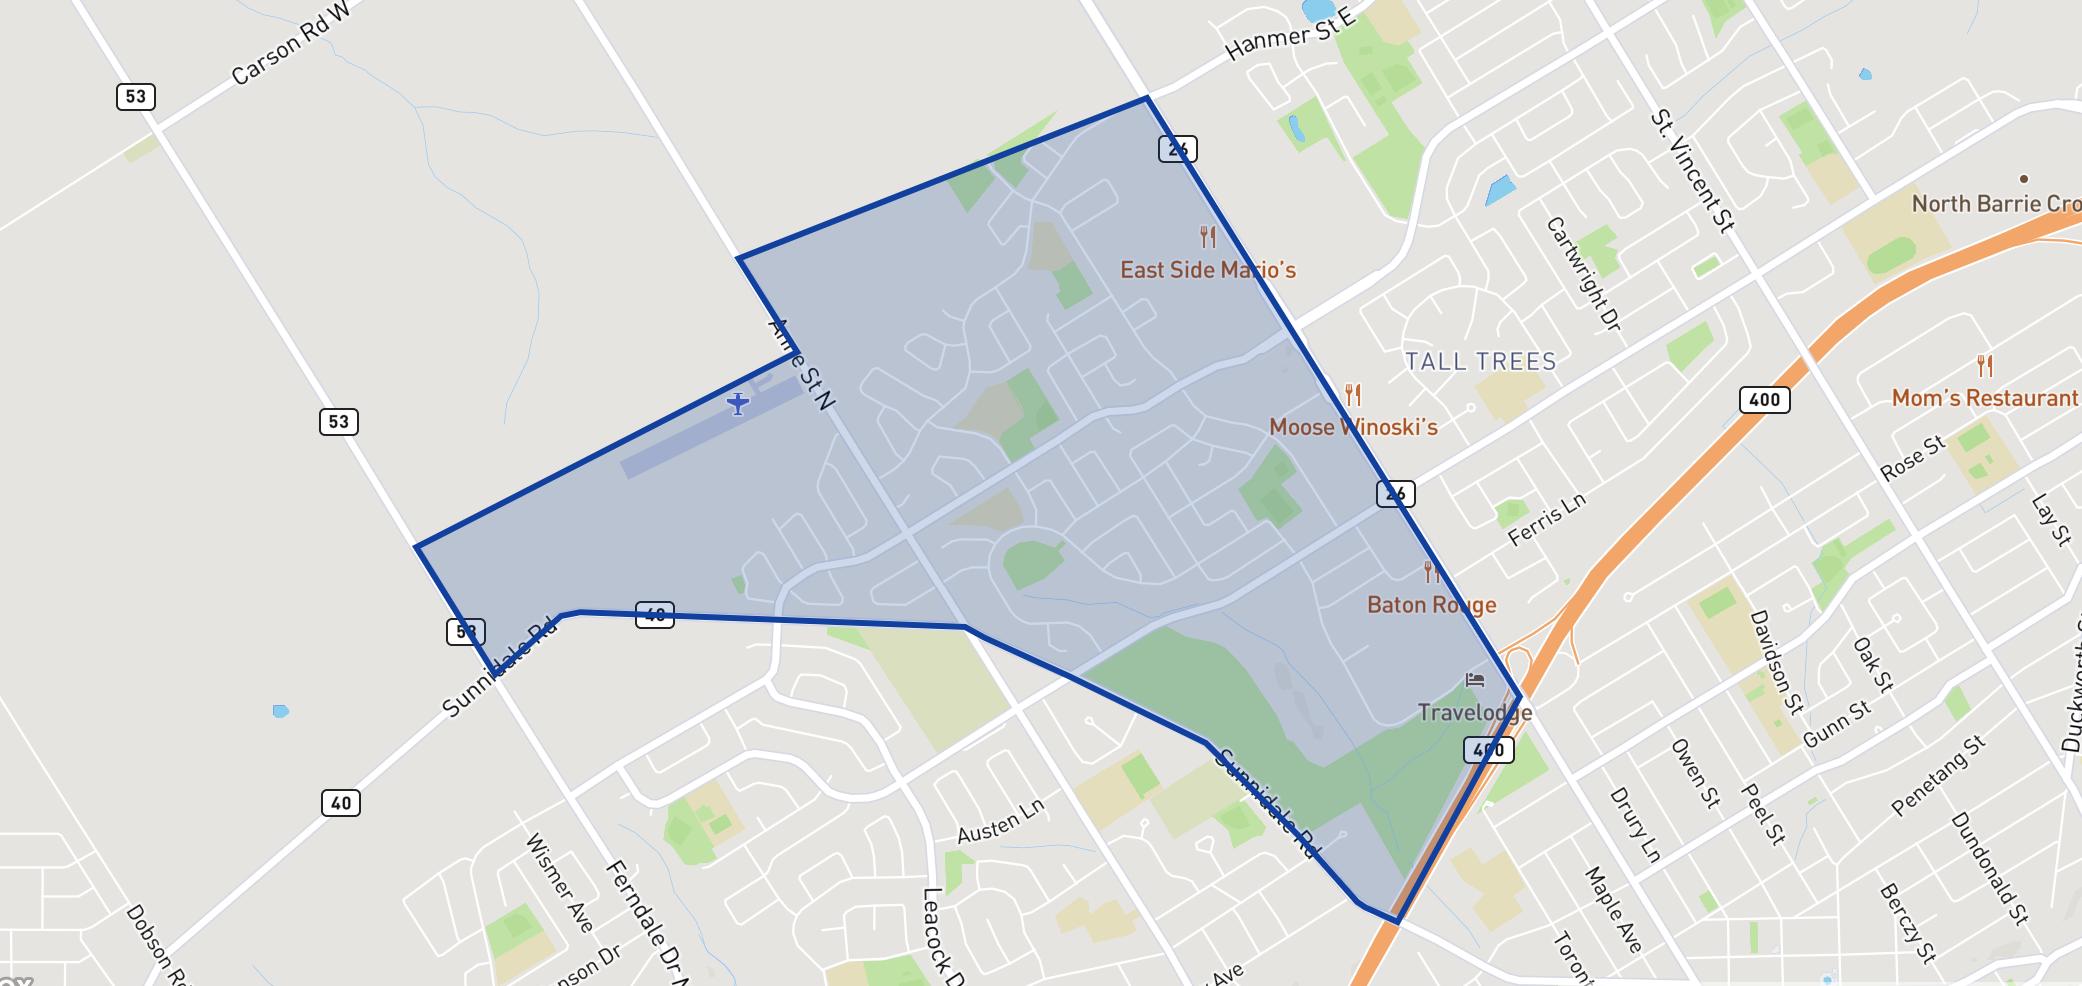 Sunnidale neighbourhood borders